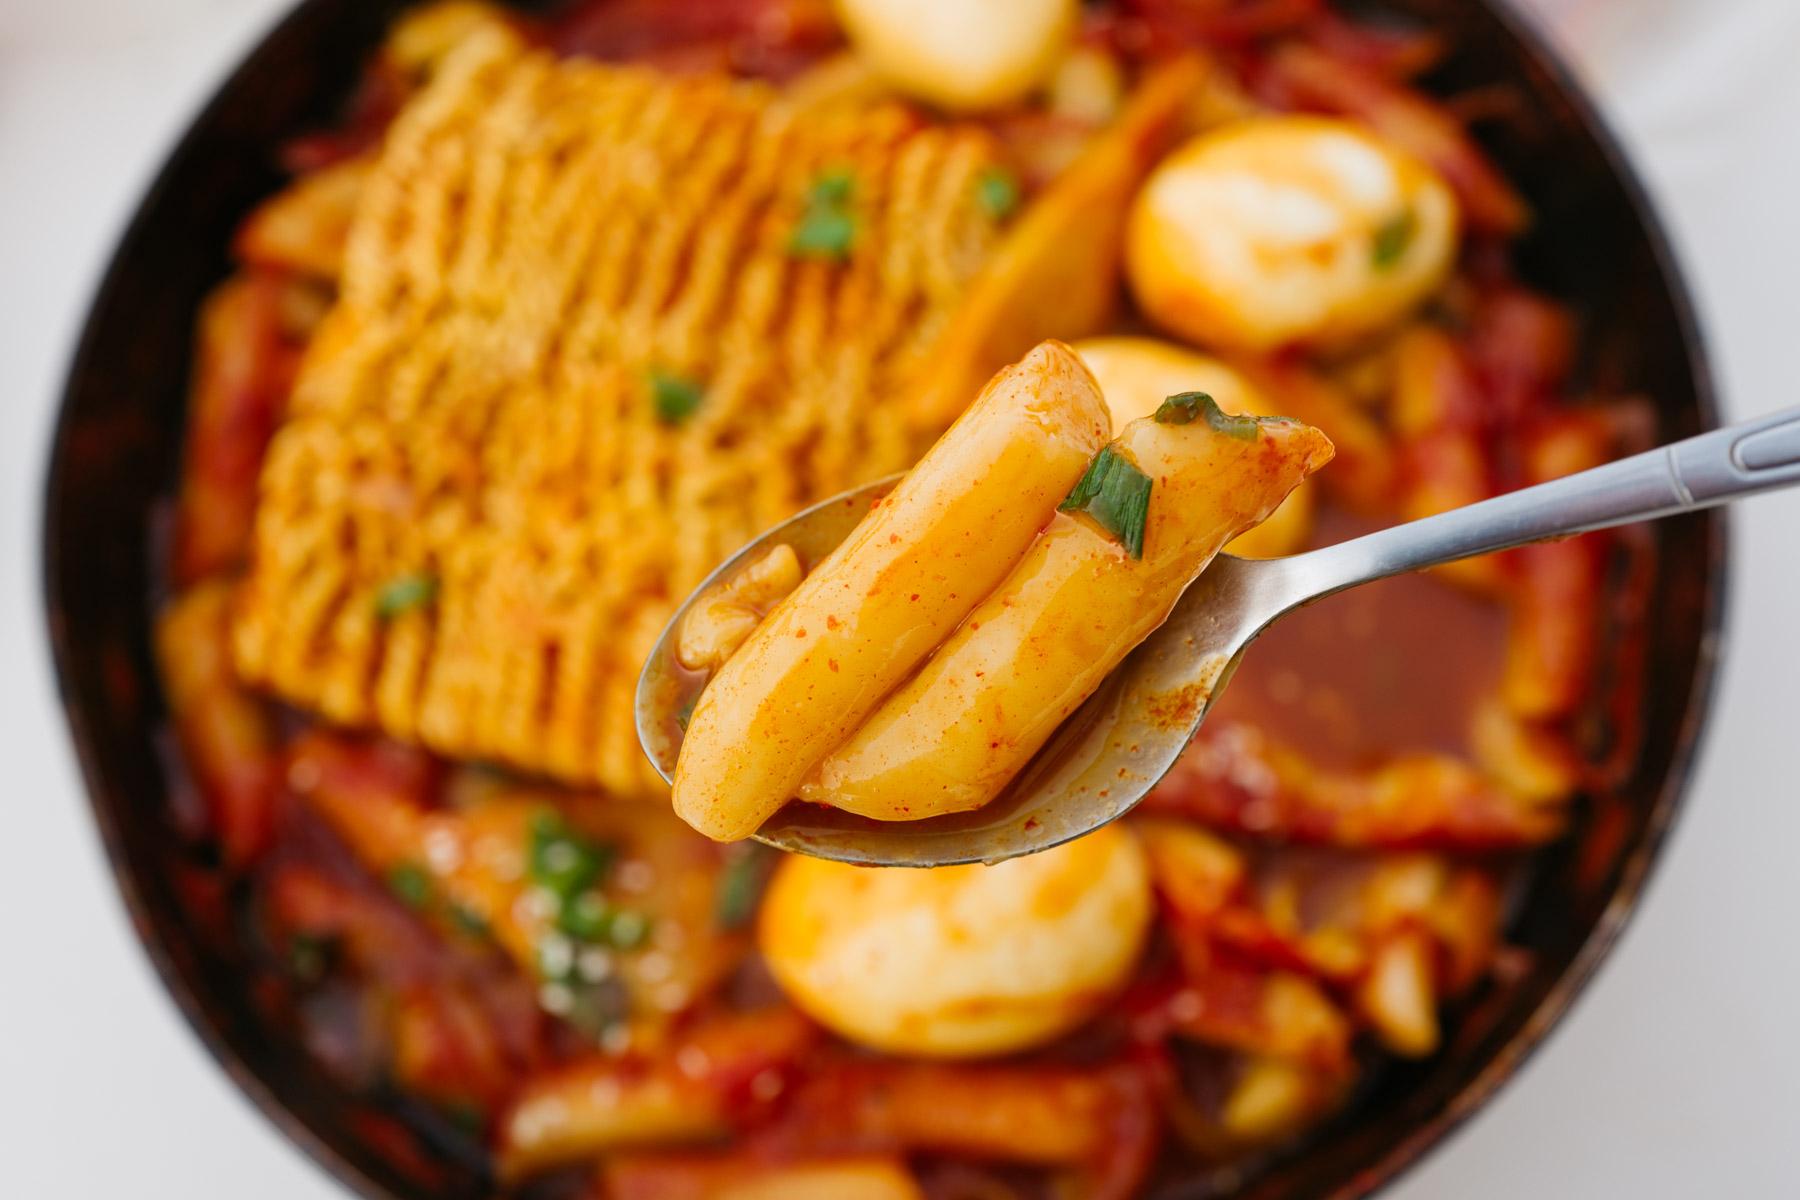 Rabokki 라볶이 - pikantne ryżowe kluski z makaronem instant